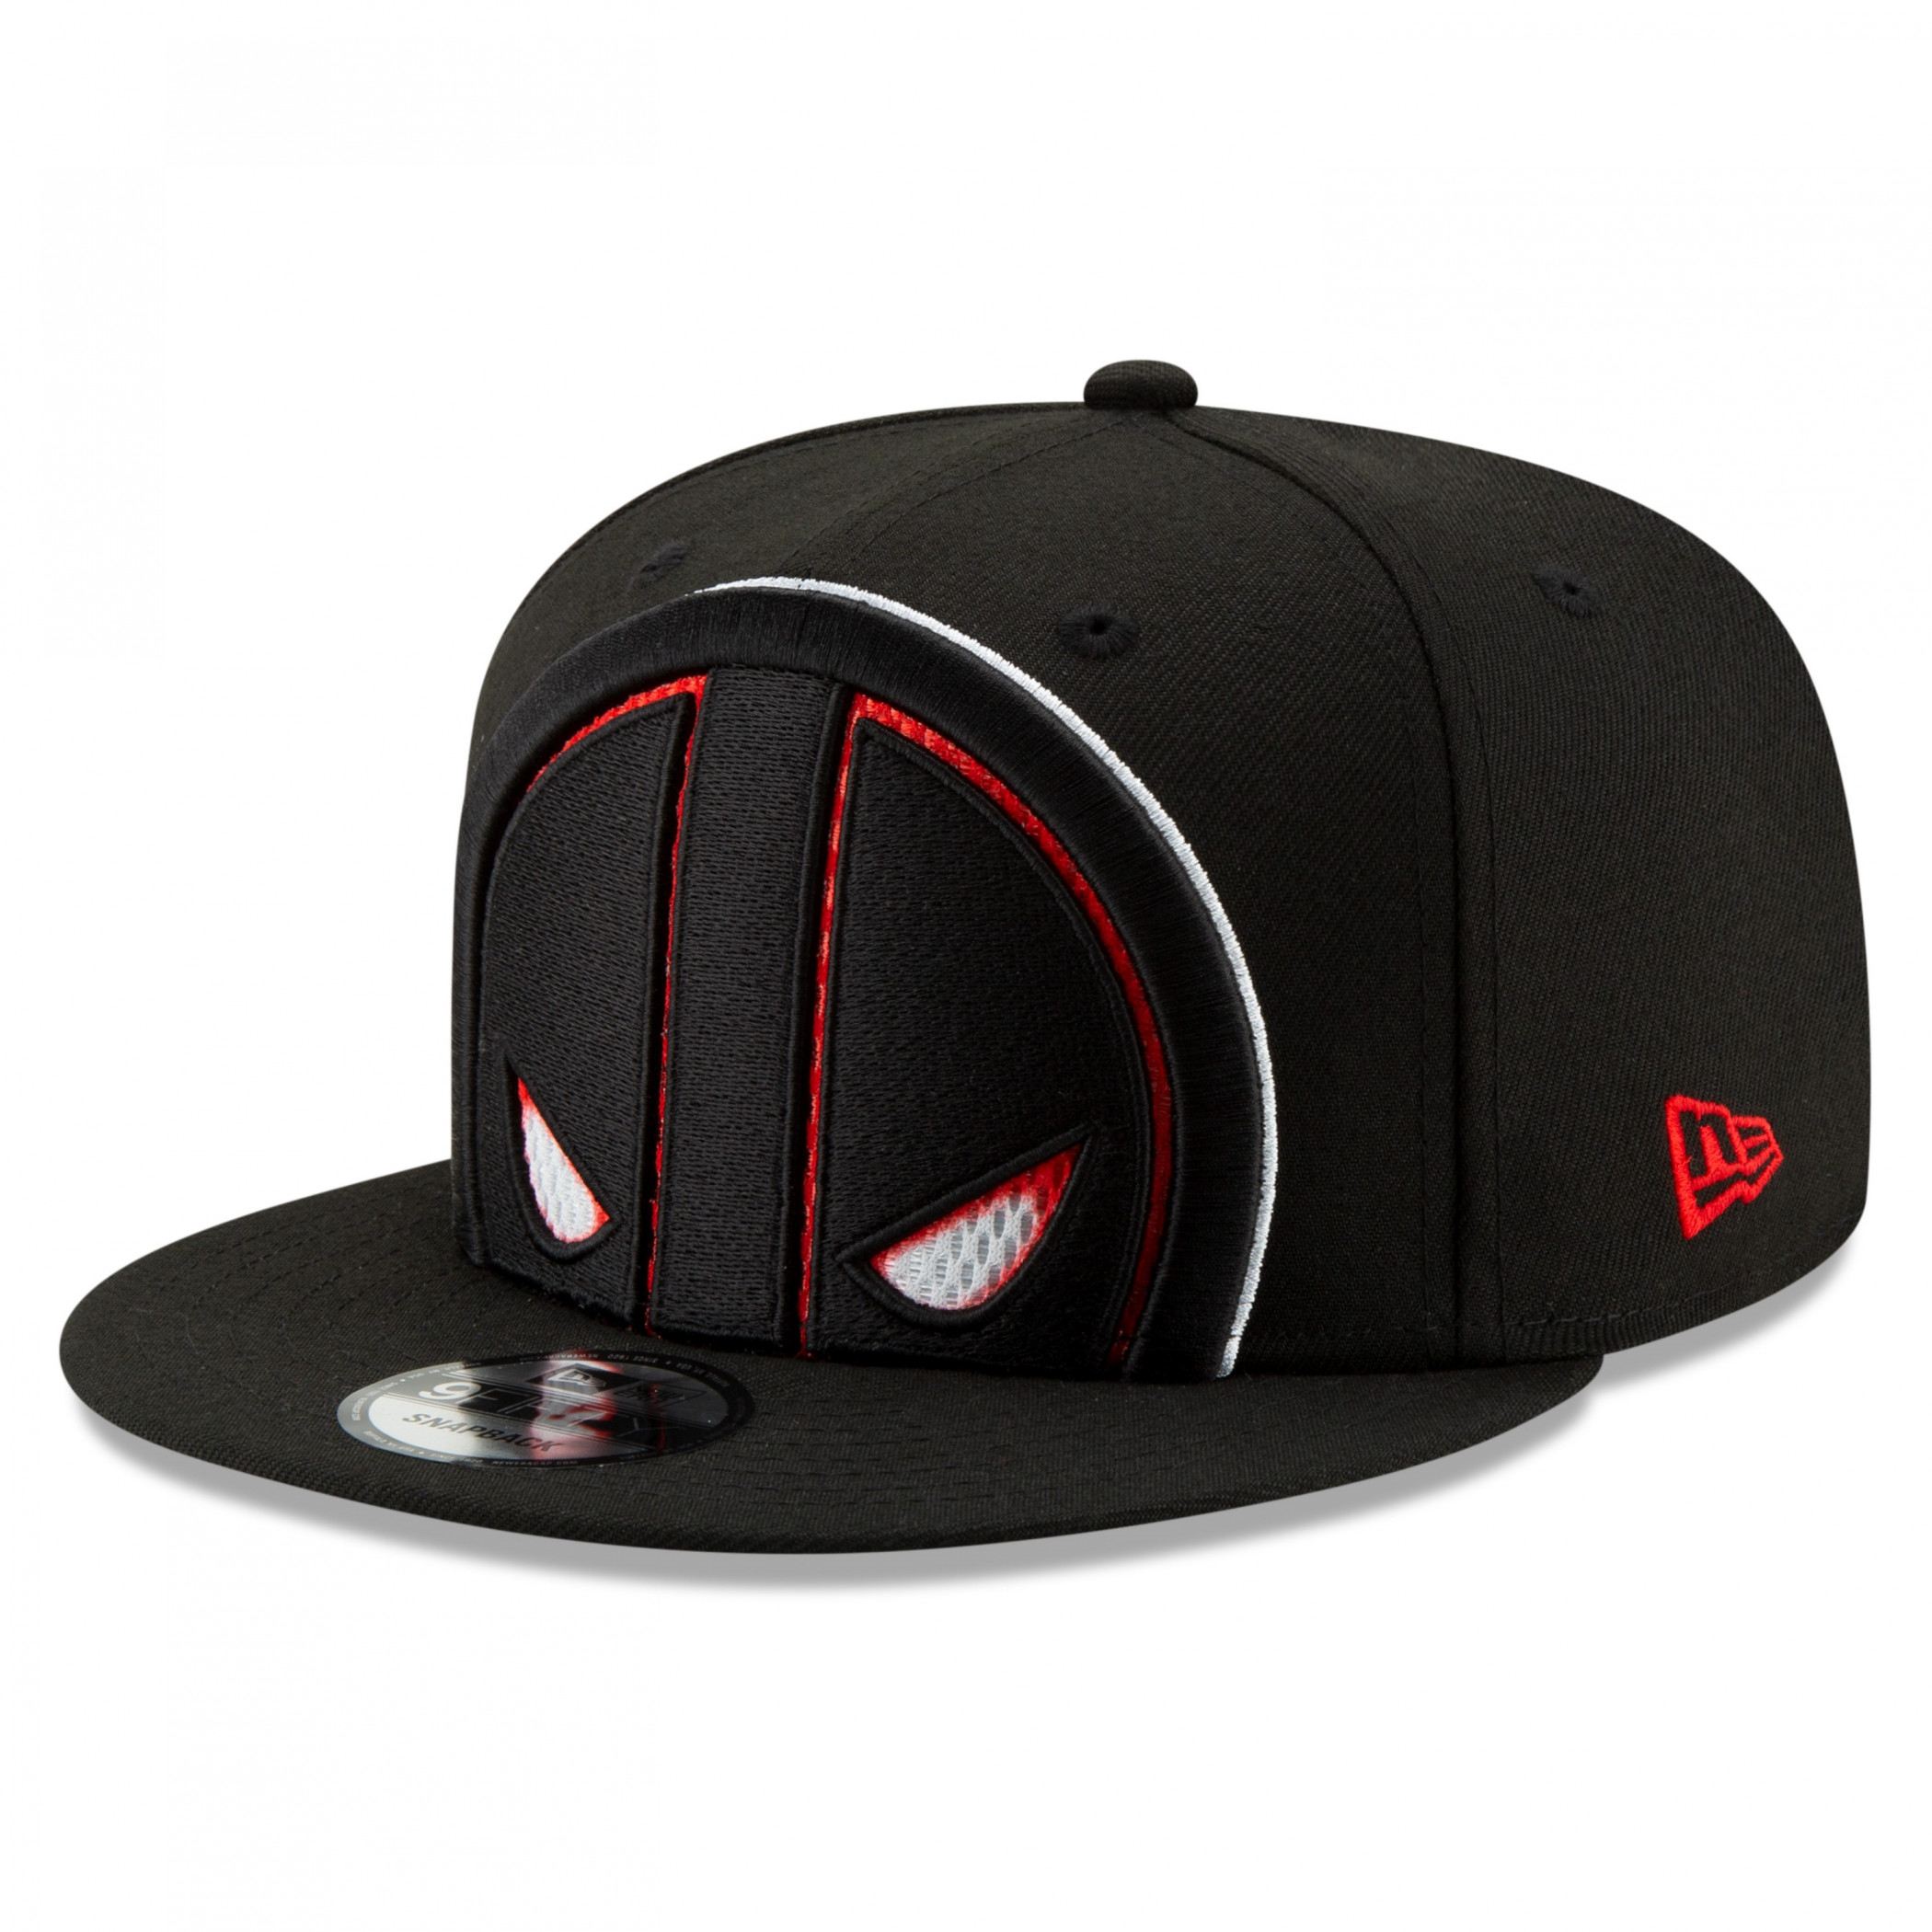 Deadpool Symbol Color Trim New Era 9Fifty Adjustable Youth Hat